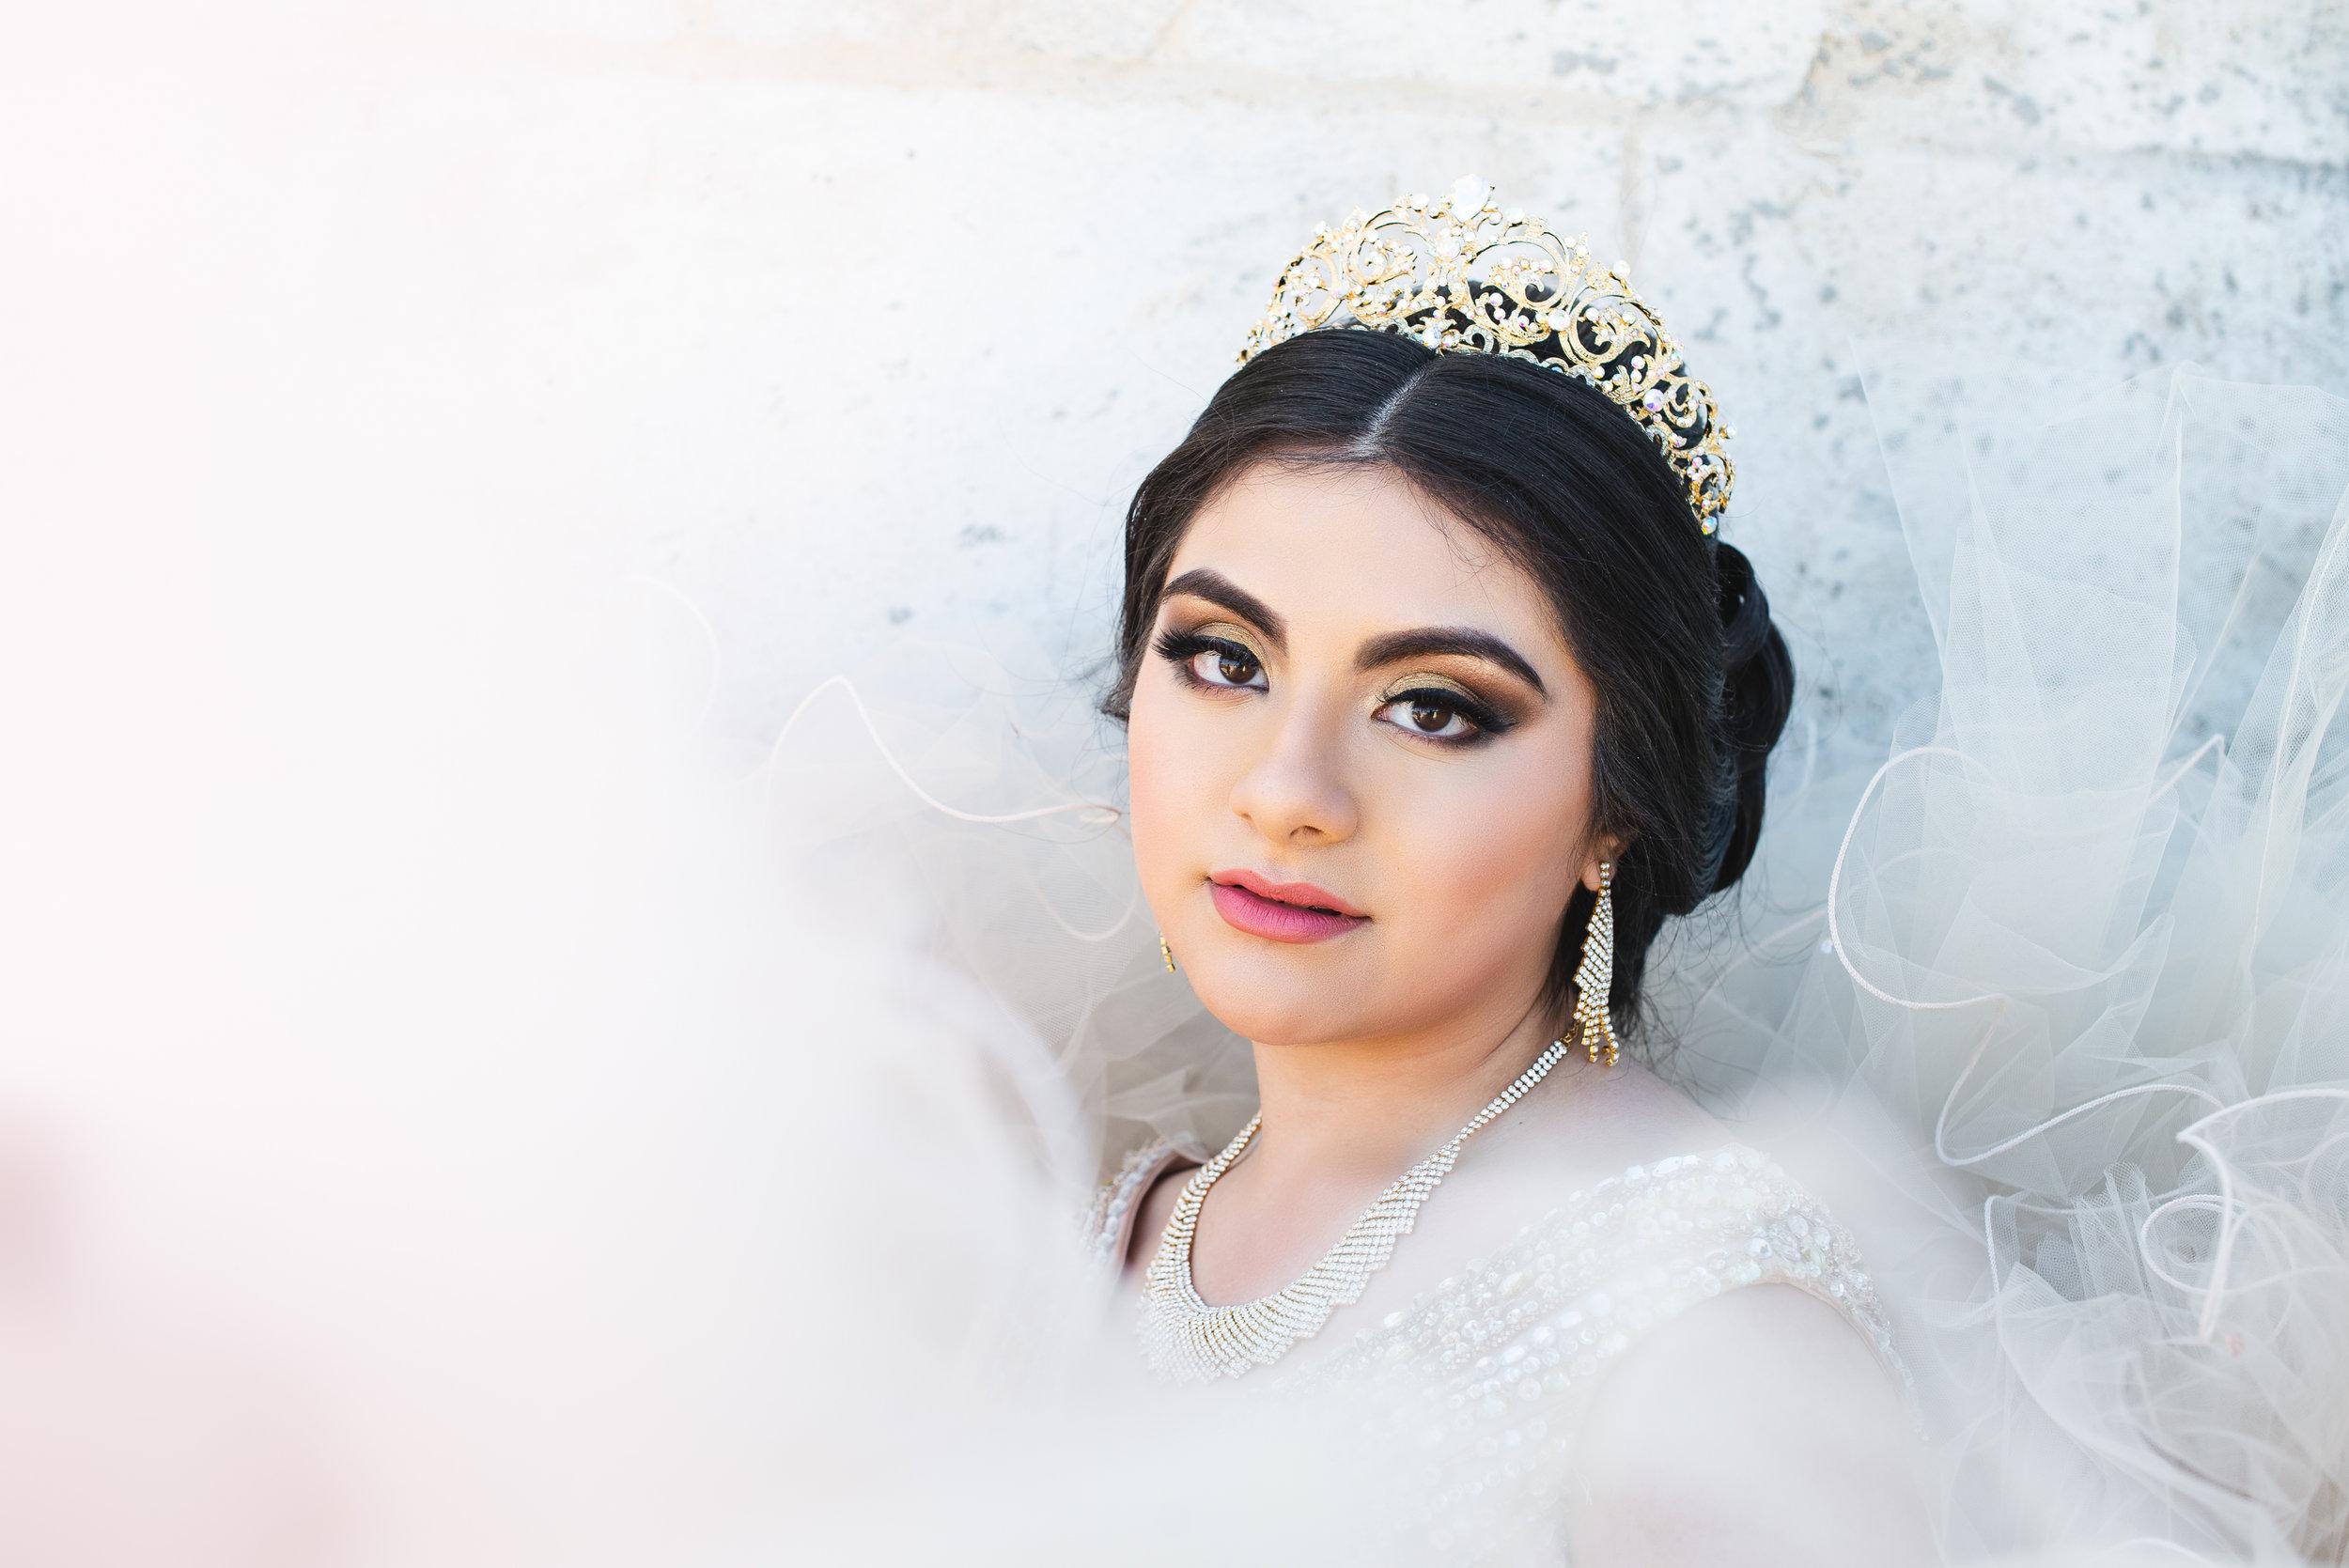 best houston quinceanera wedding photogorapher in text photographer photography.jpg